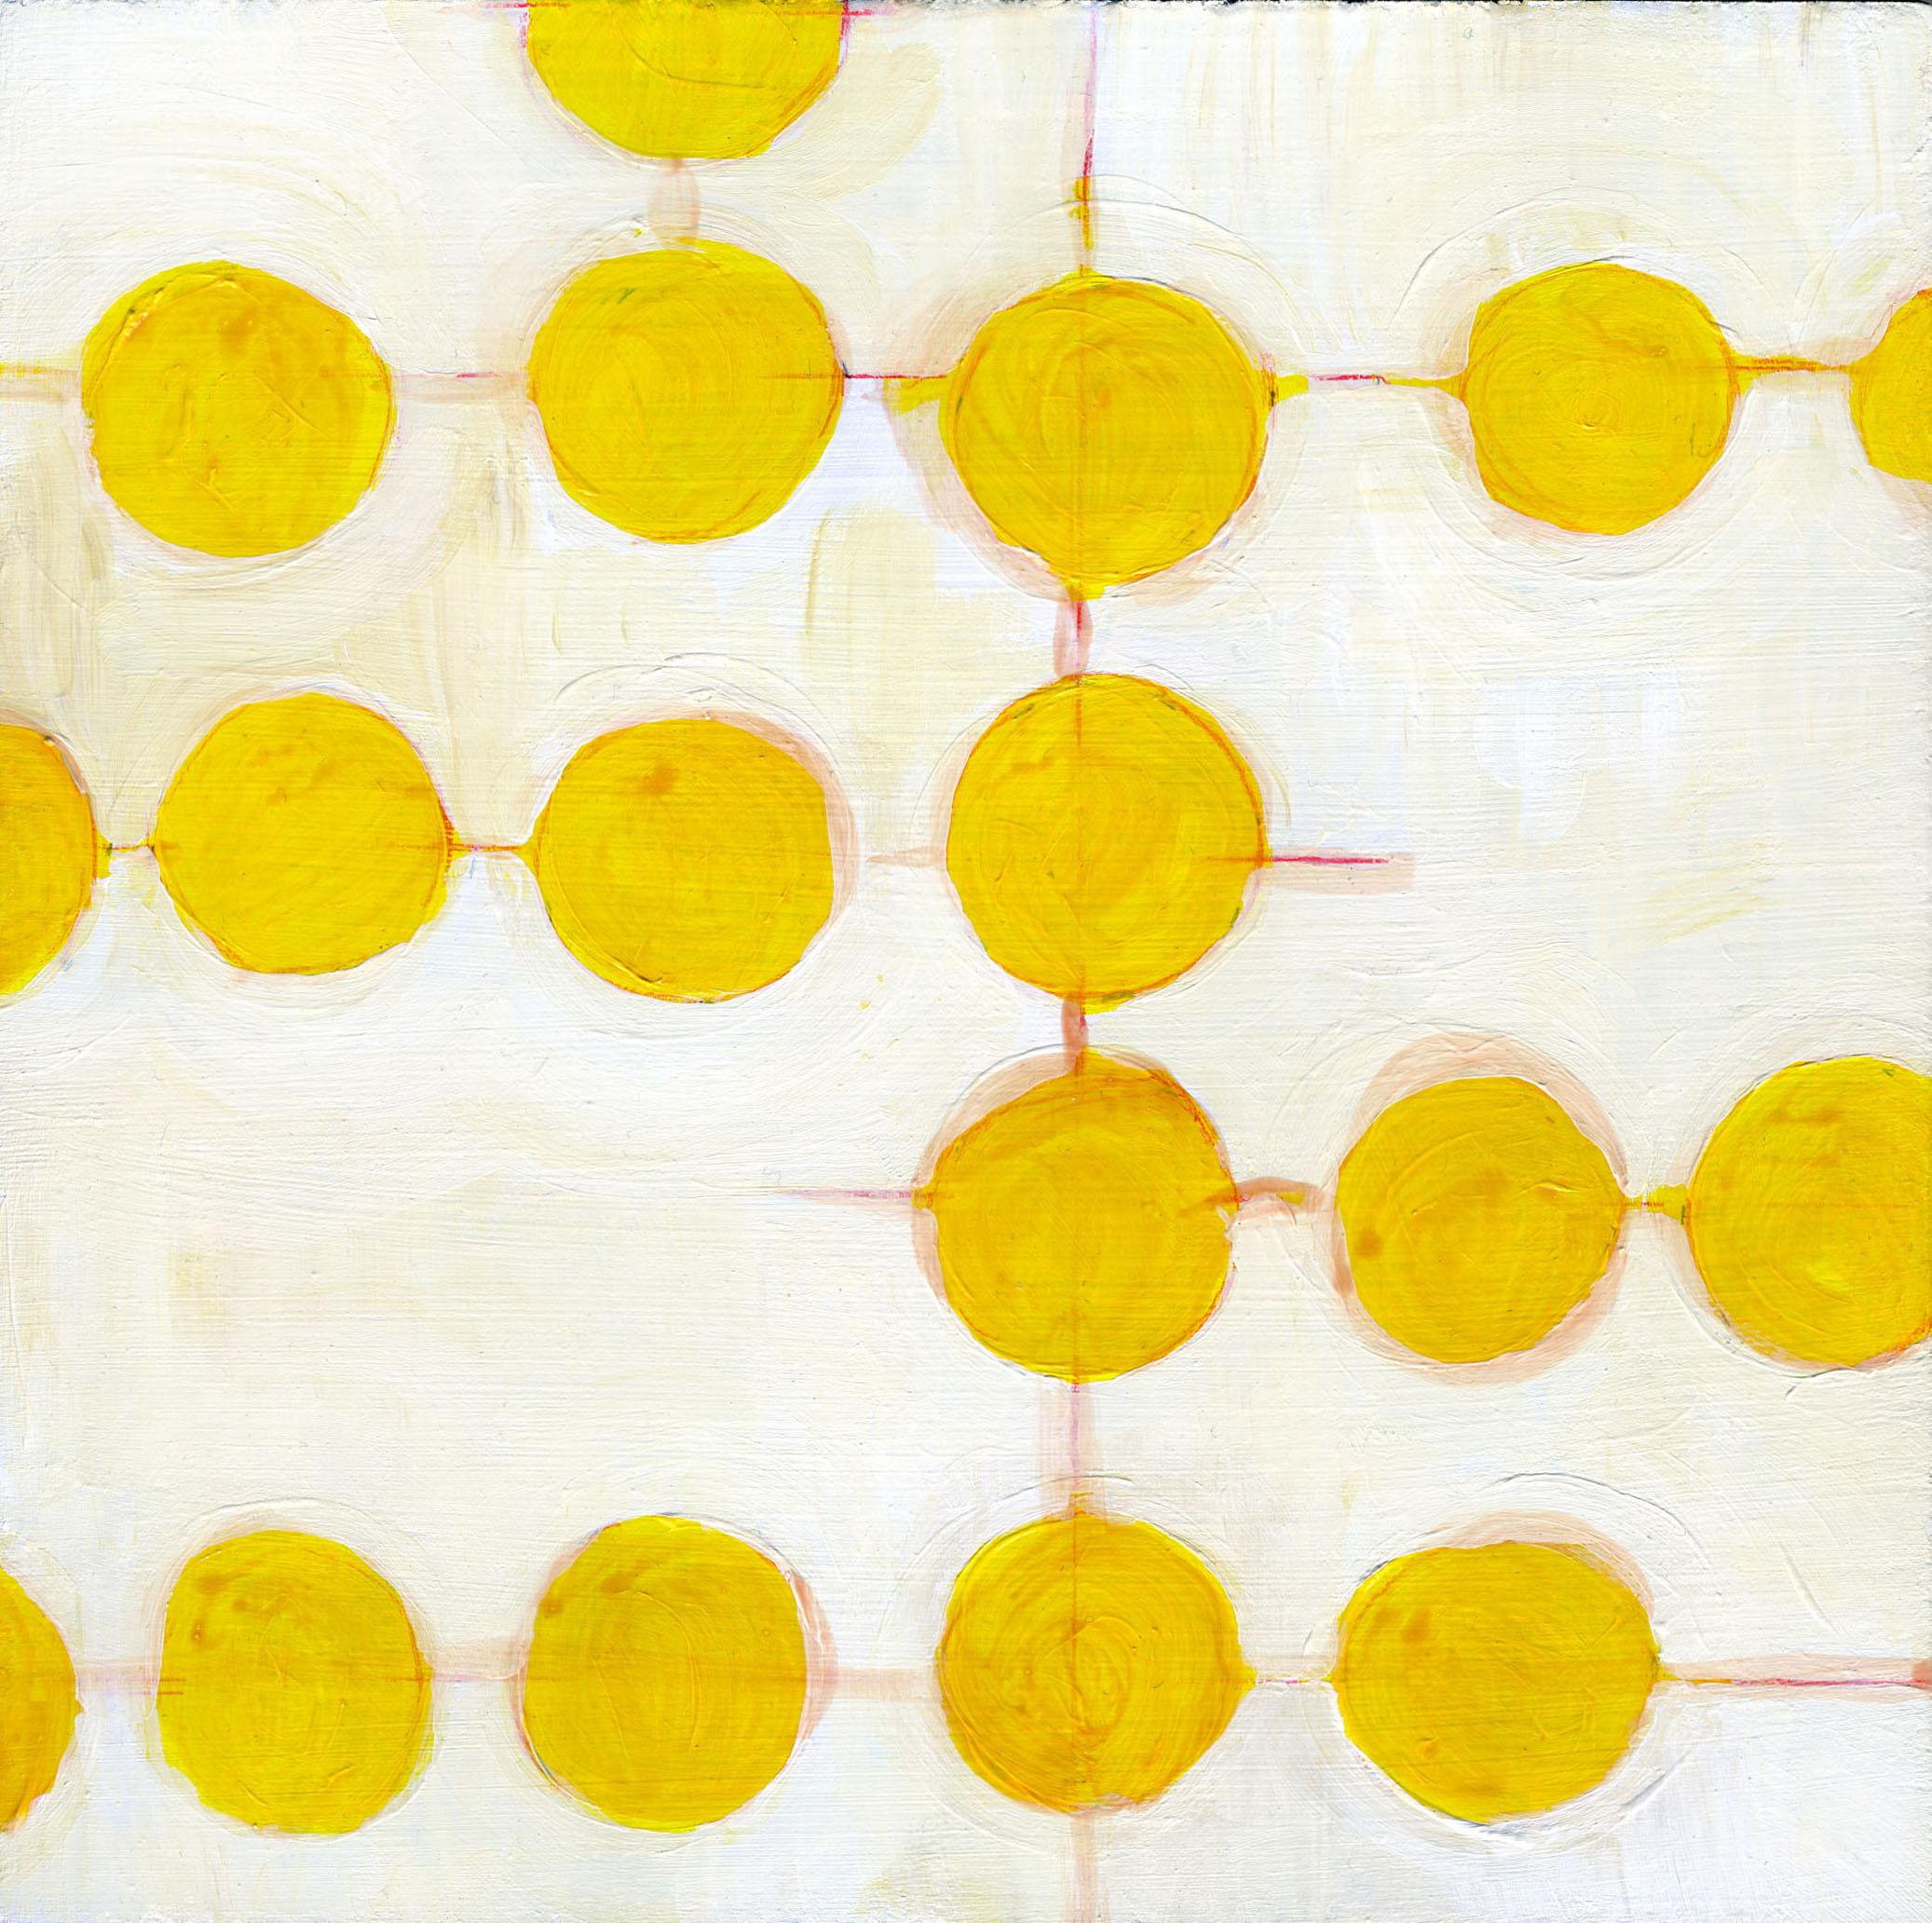 FamilyTree: Constellation of Understanding #2  2007-2008